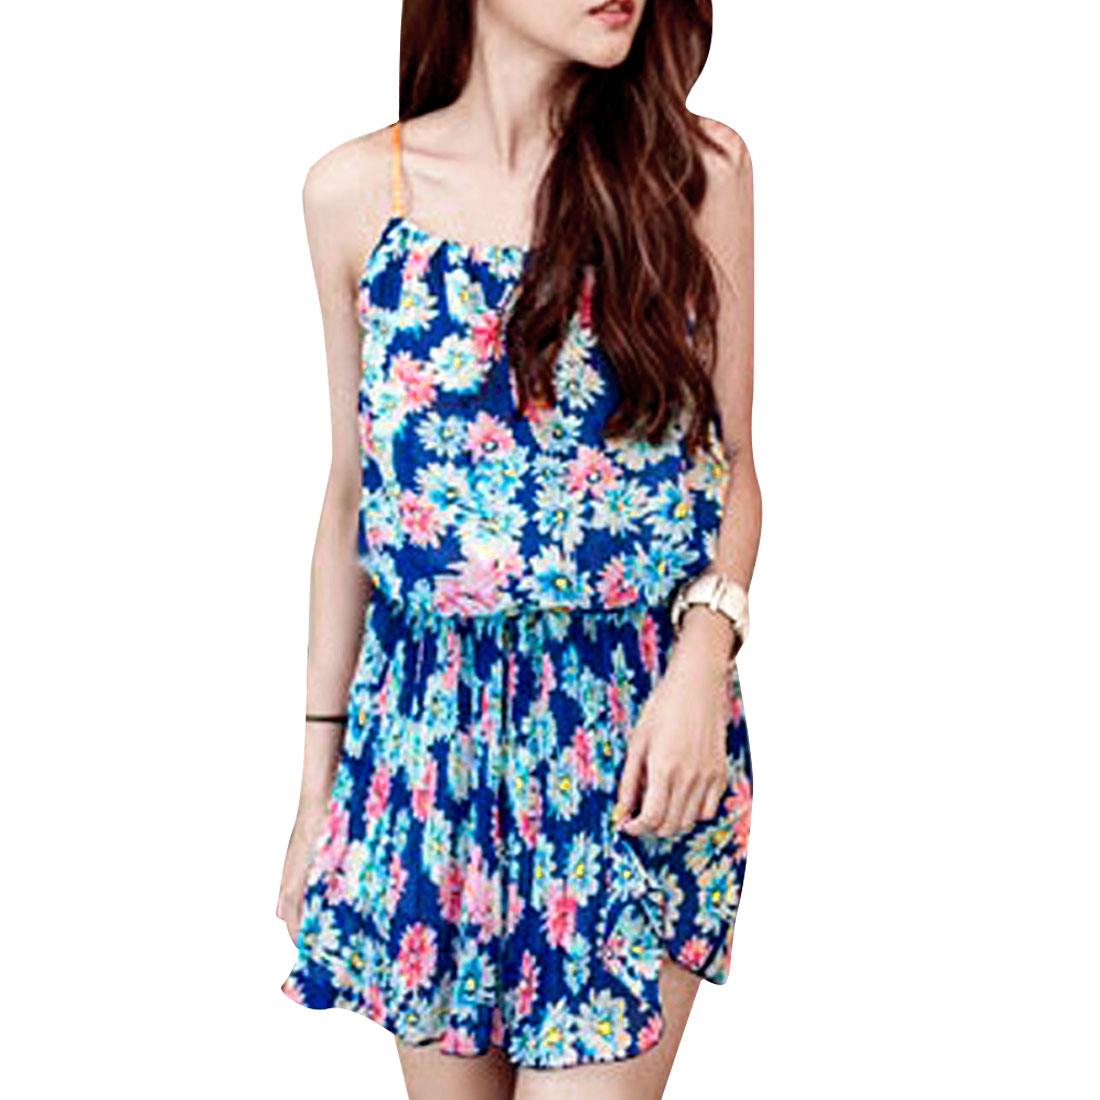 Lady Blue Pullover Flower Design Weaved Strap Chiffon Dress XS